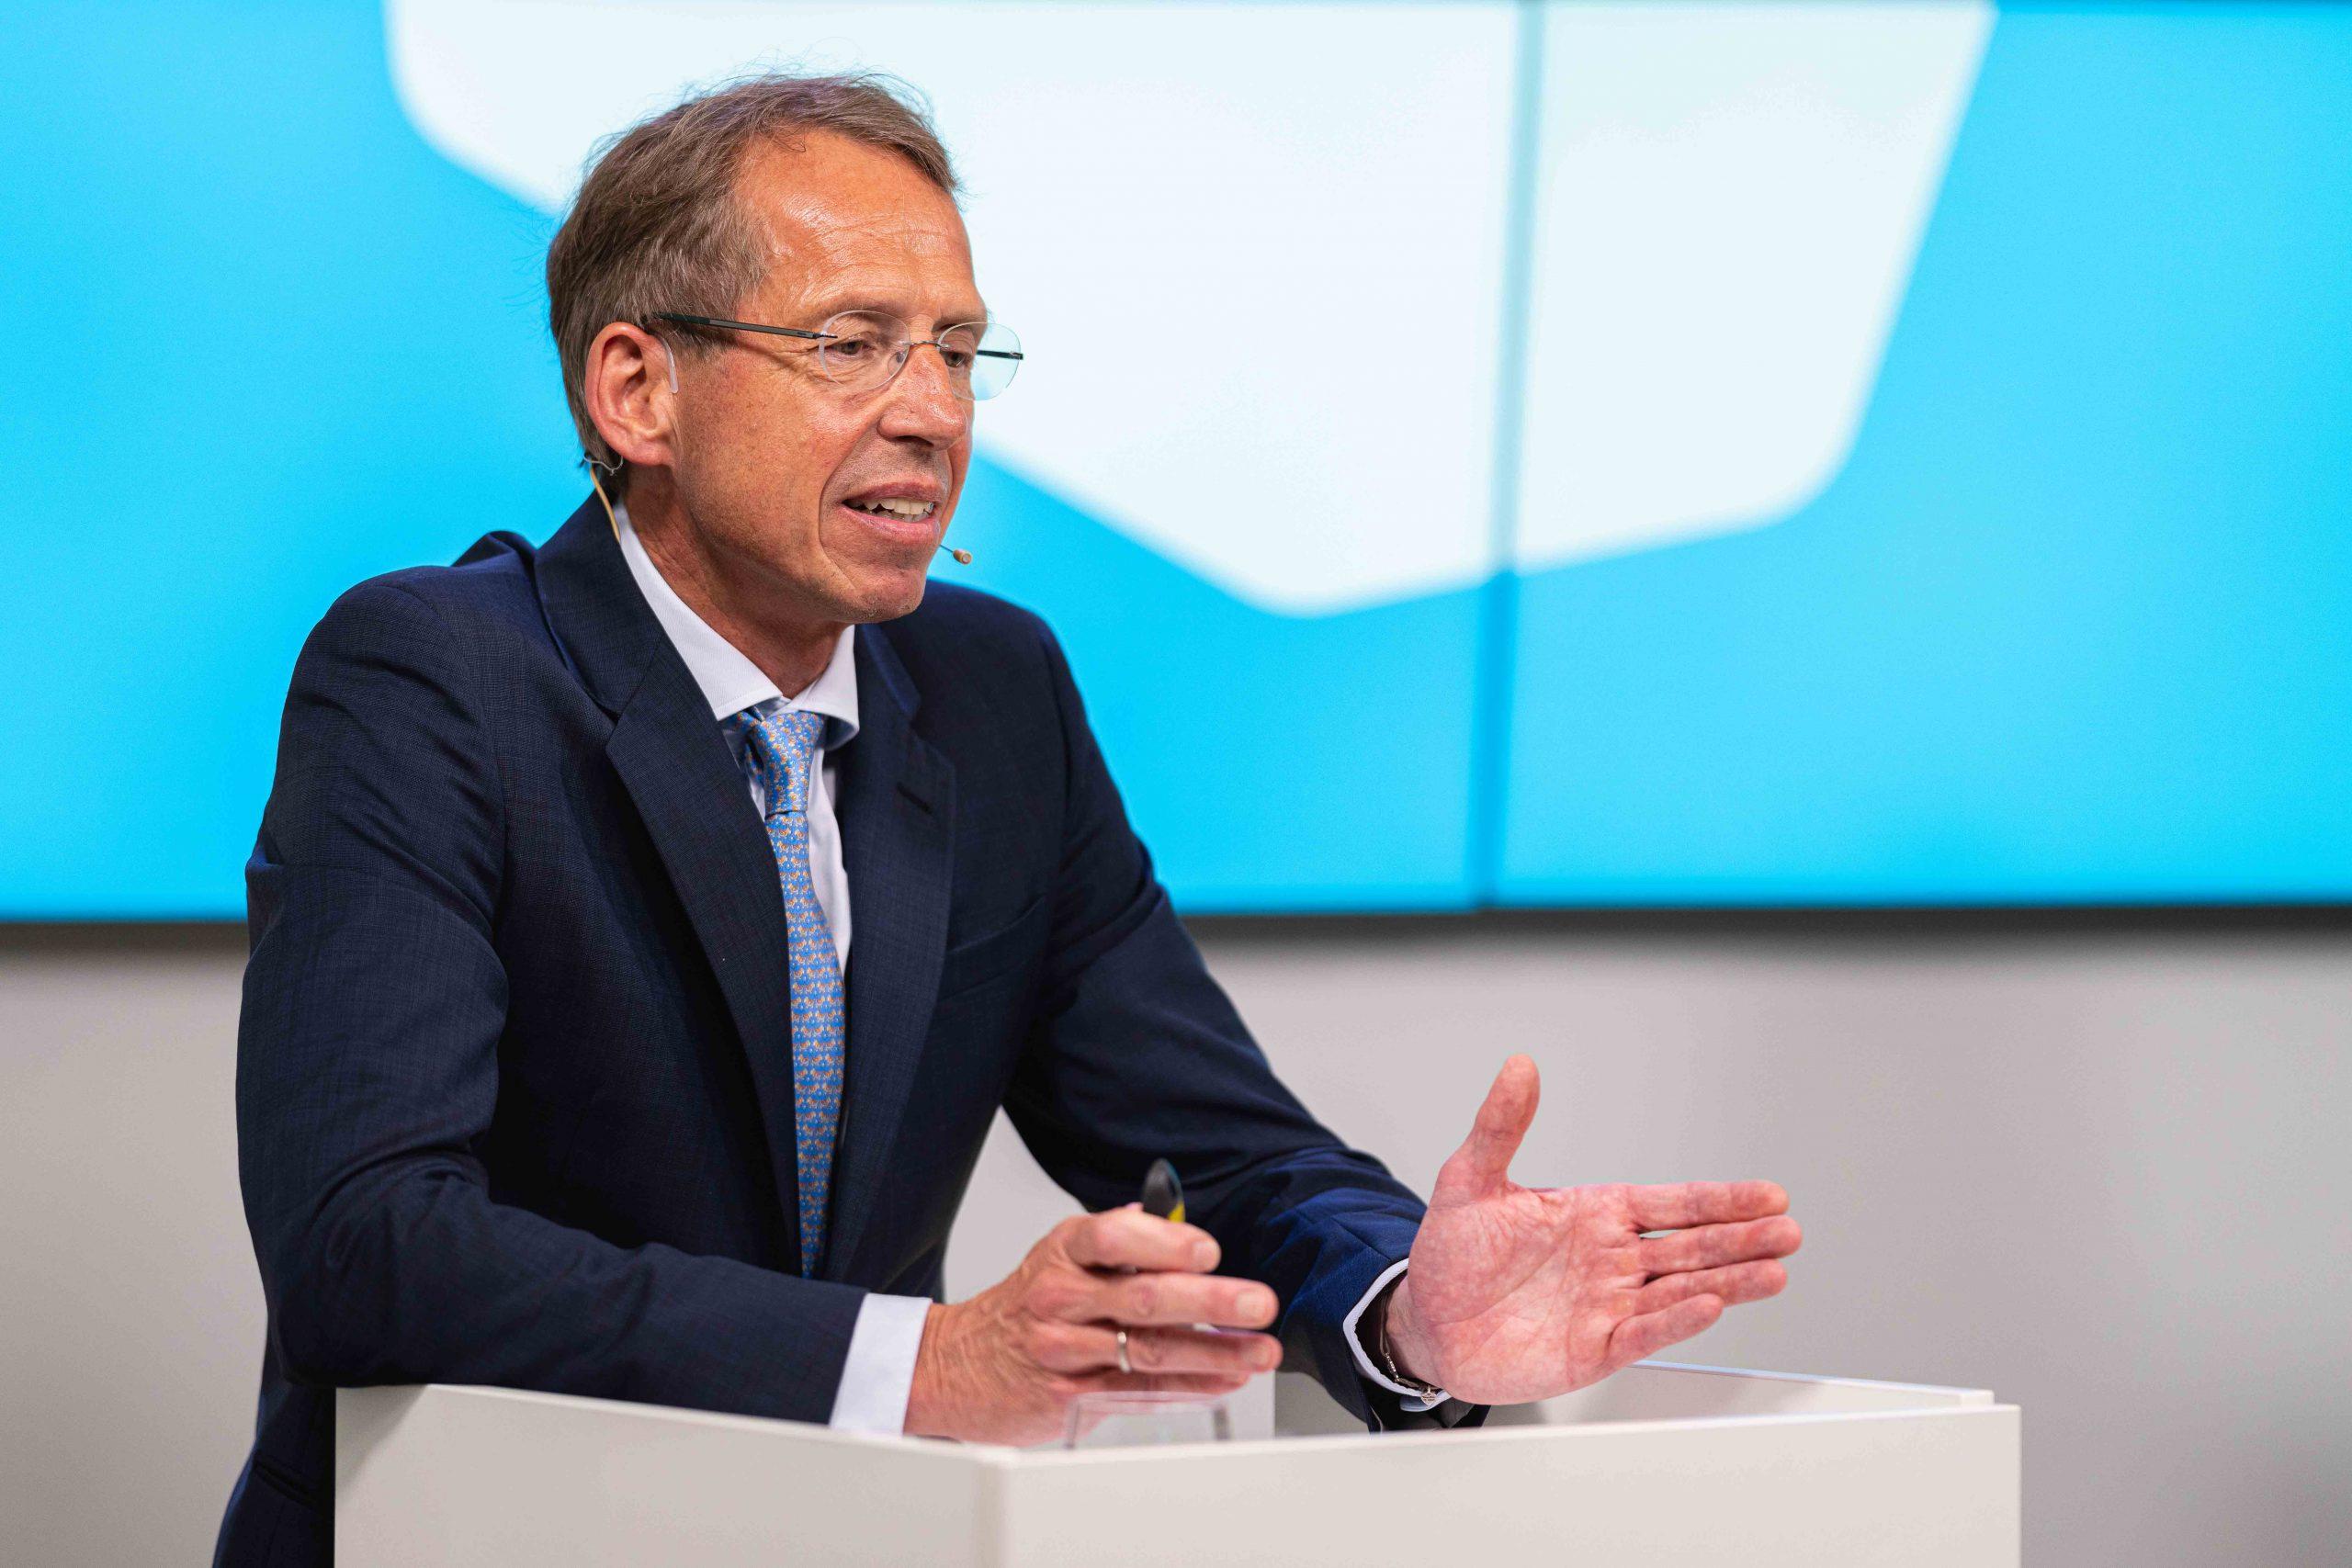 Dr. Roland Gerlach